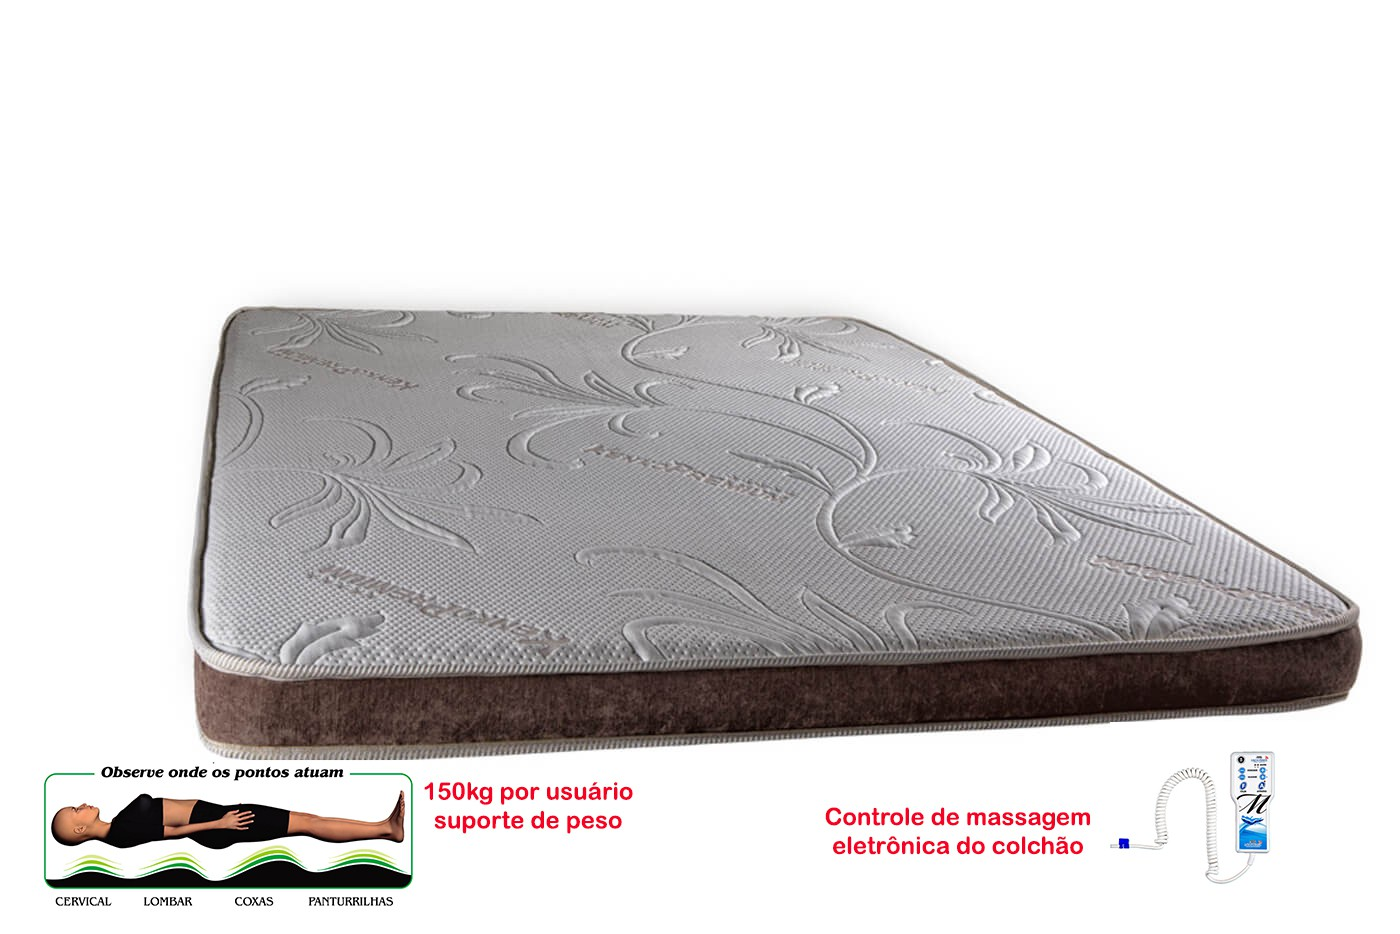 Manta Magnética Colchonete  Kenko Premium Casal C/ Massagem Eletrônica 1,38x1,88x10cm  - Kenko Premium Colchões